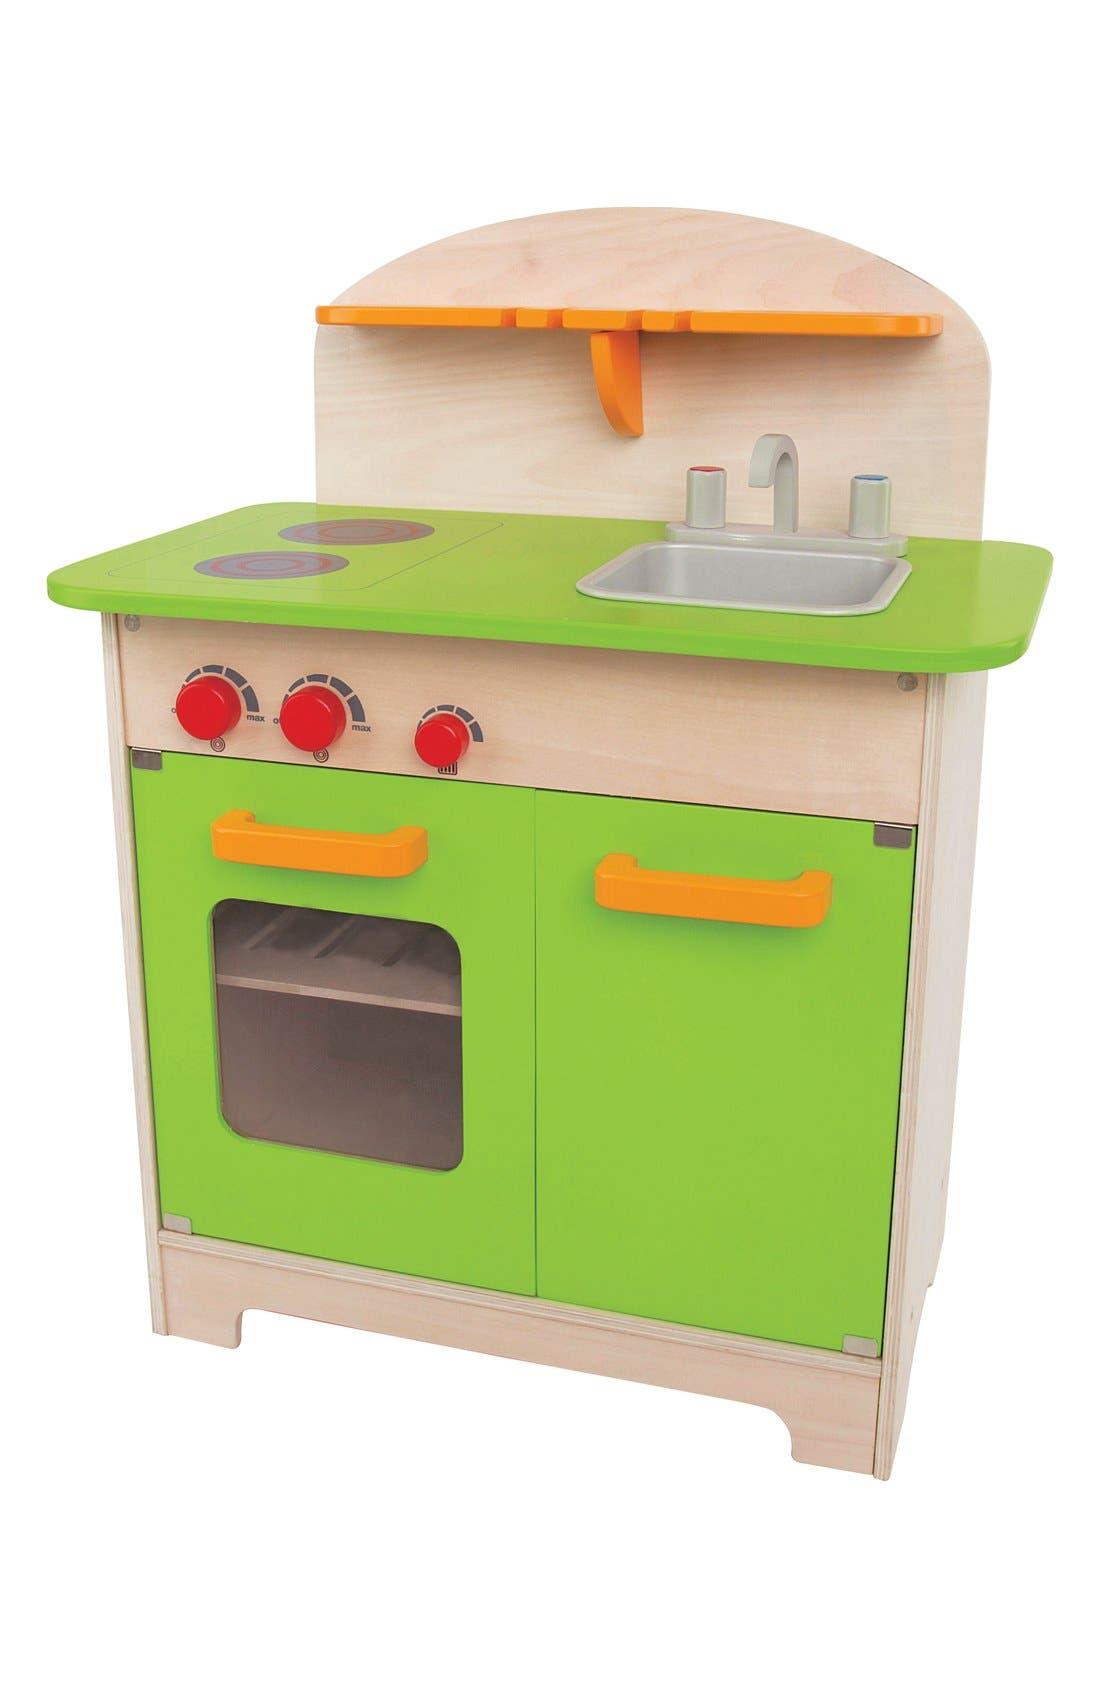 Main Image - Hape Gourmet Kitchen